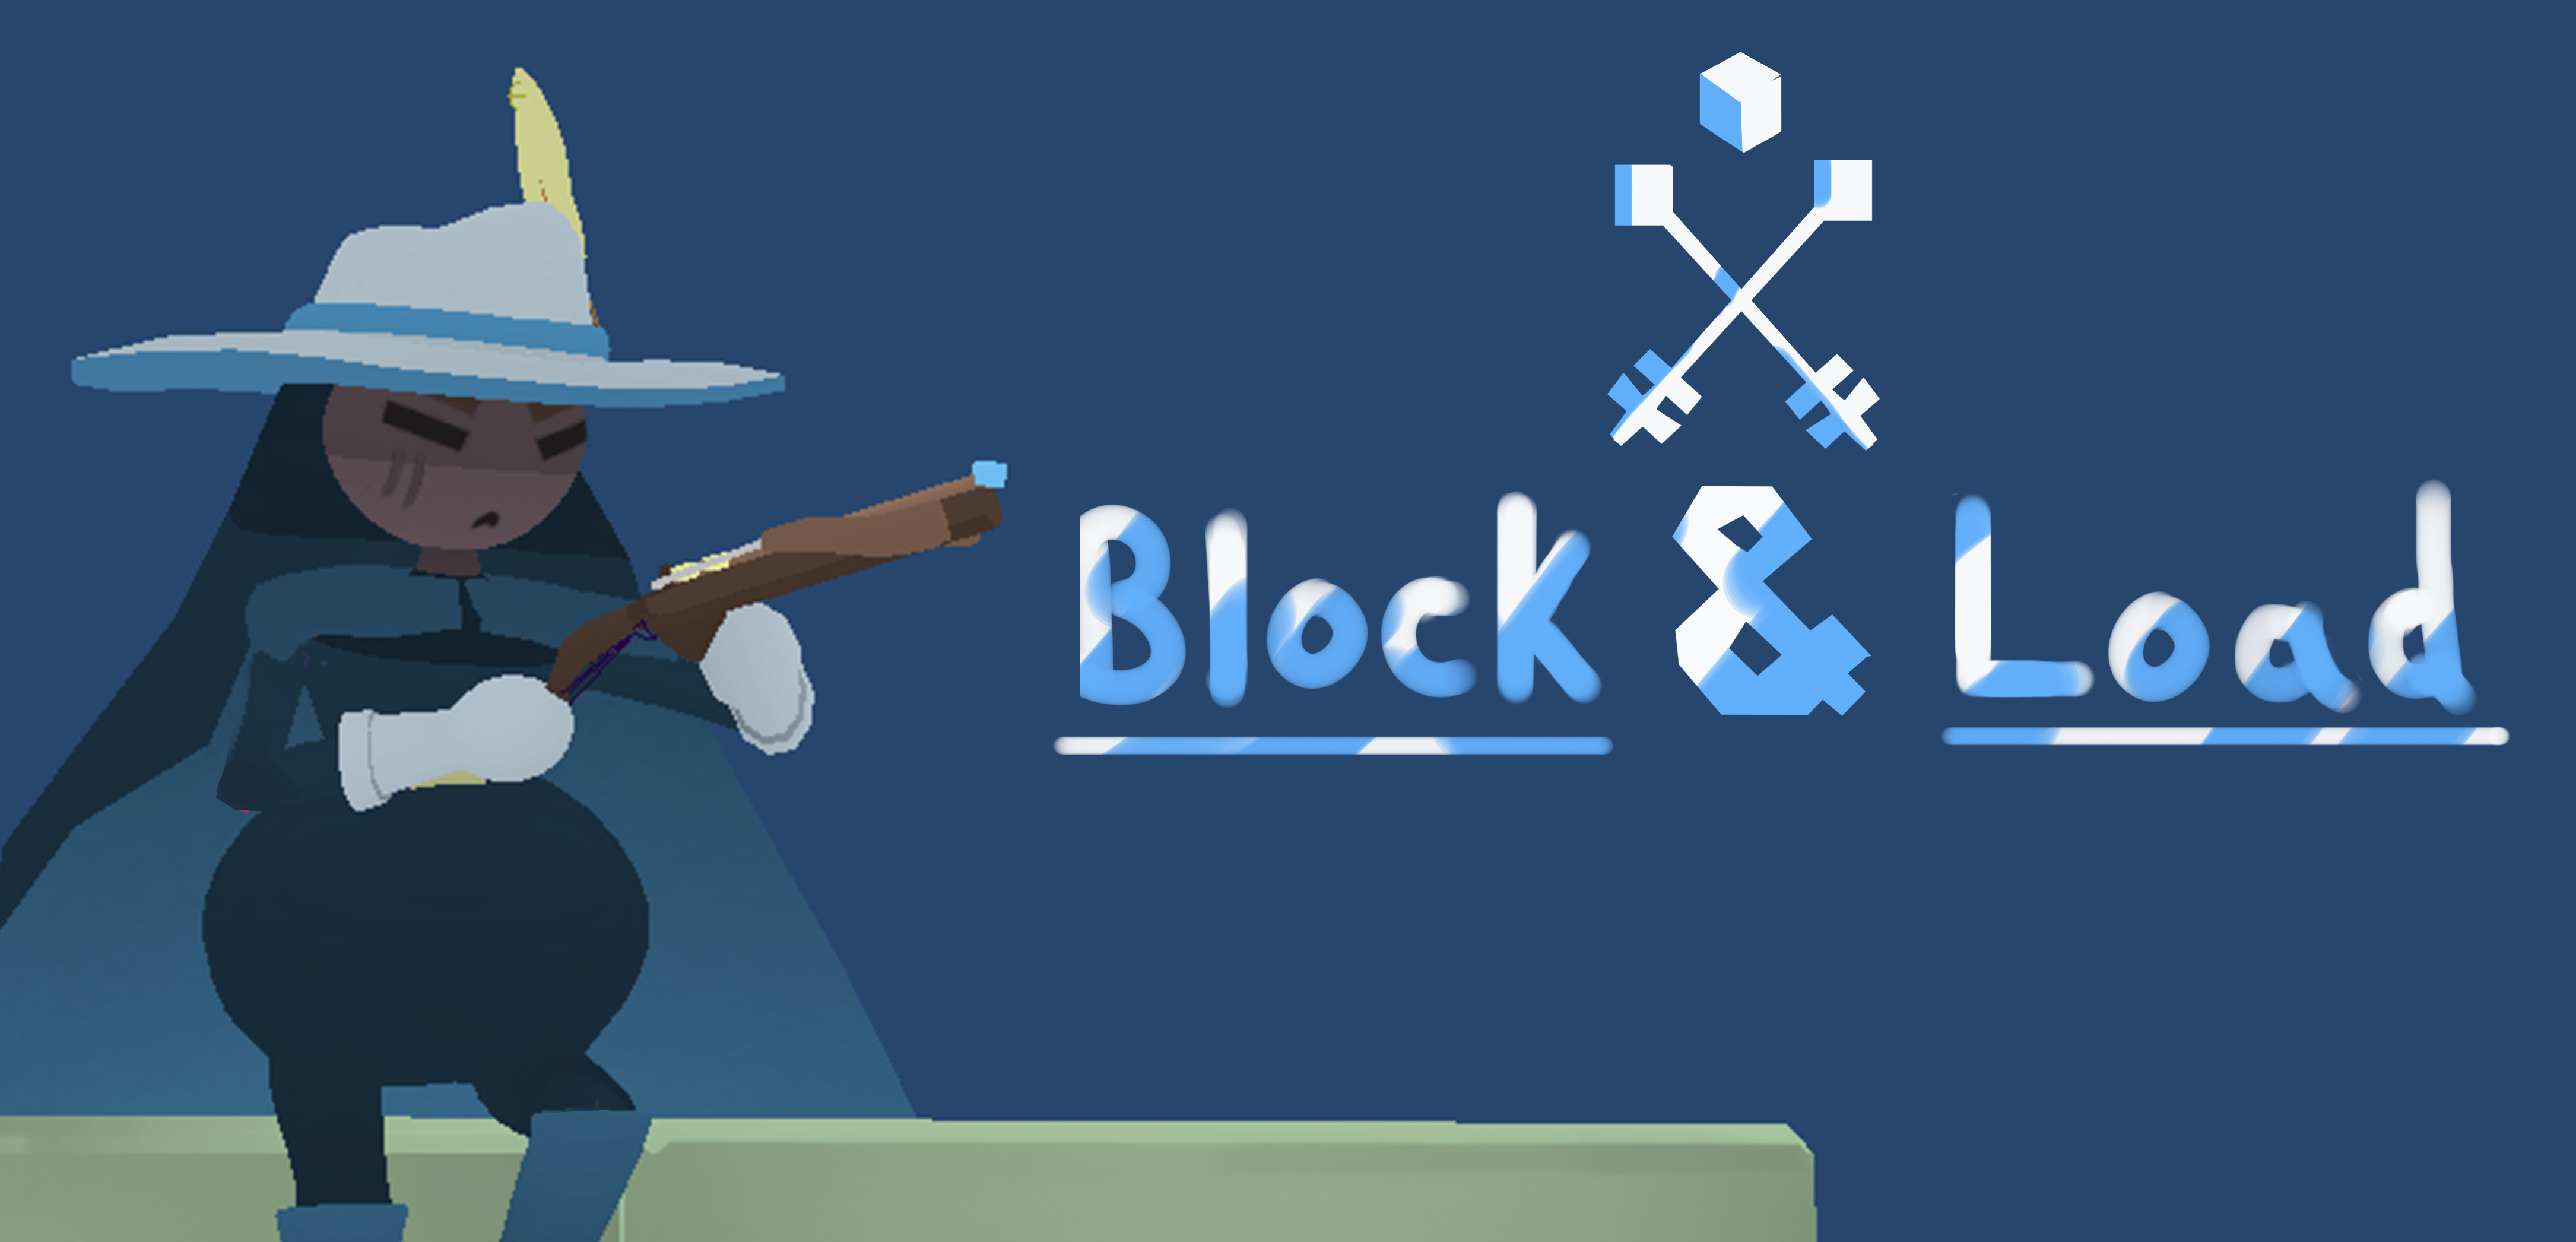 Block & Load